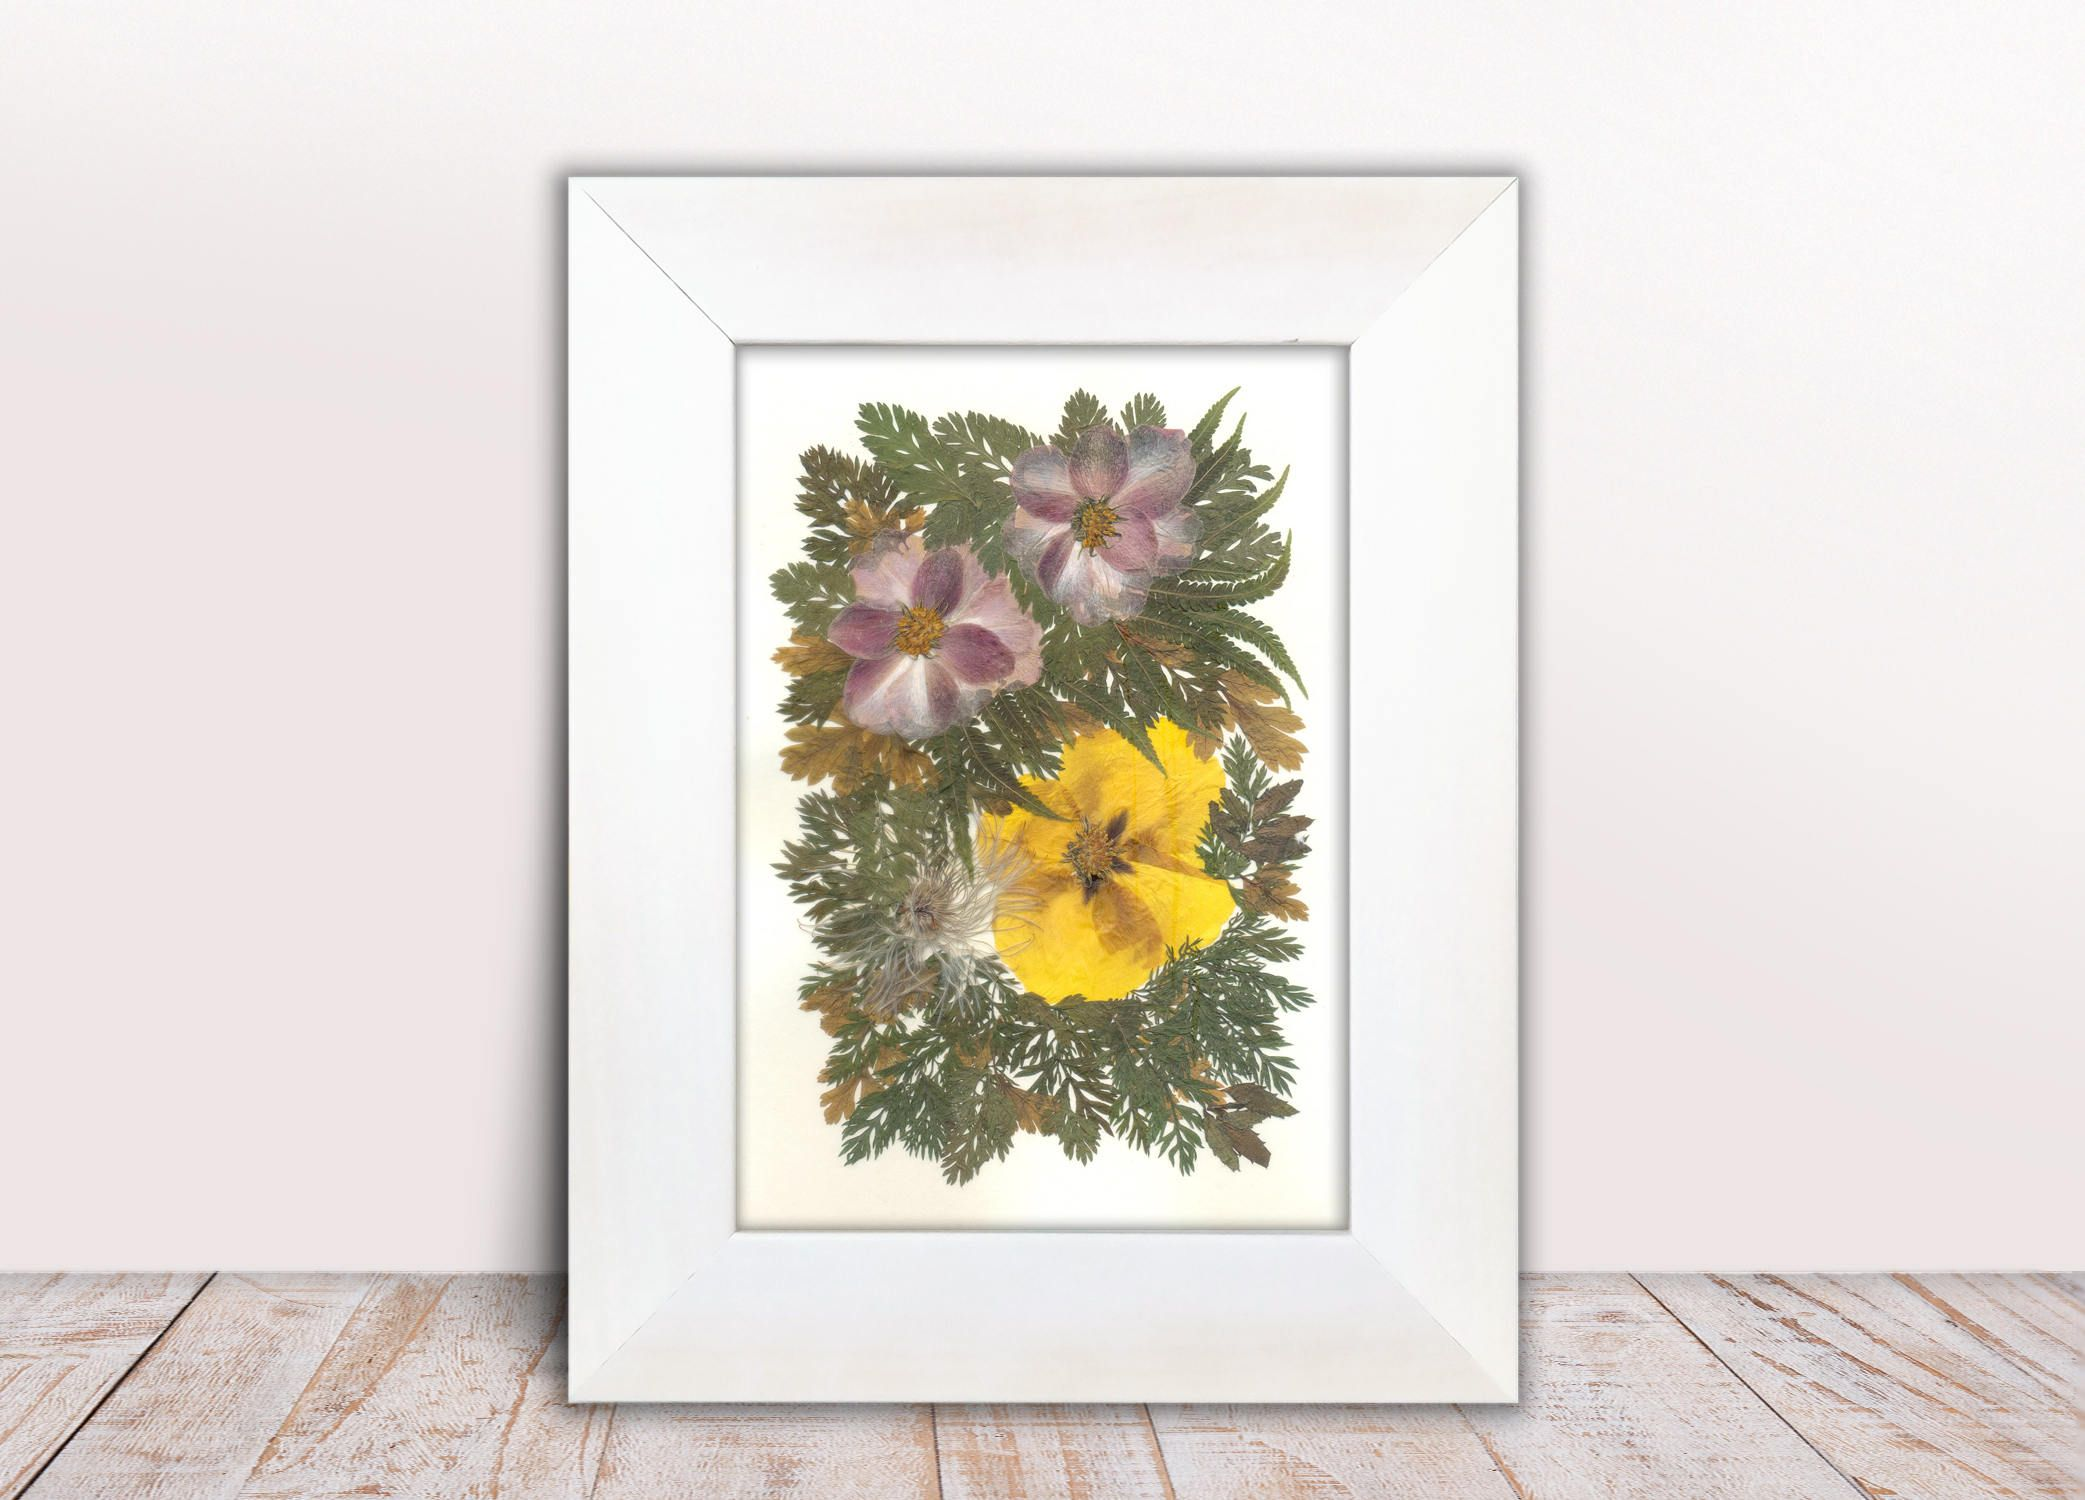 Pressed Flowers Pressed Flower Art Herbarium Rustic Art Kitchen Art ...